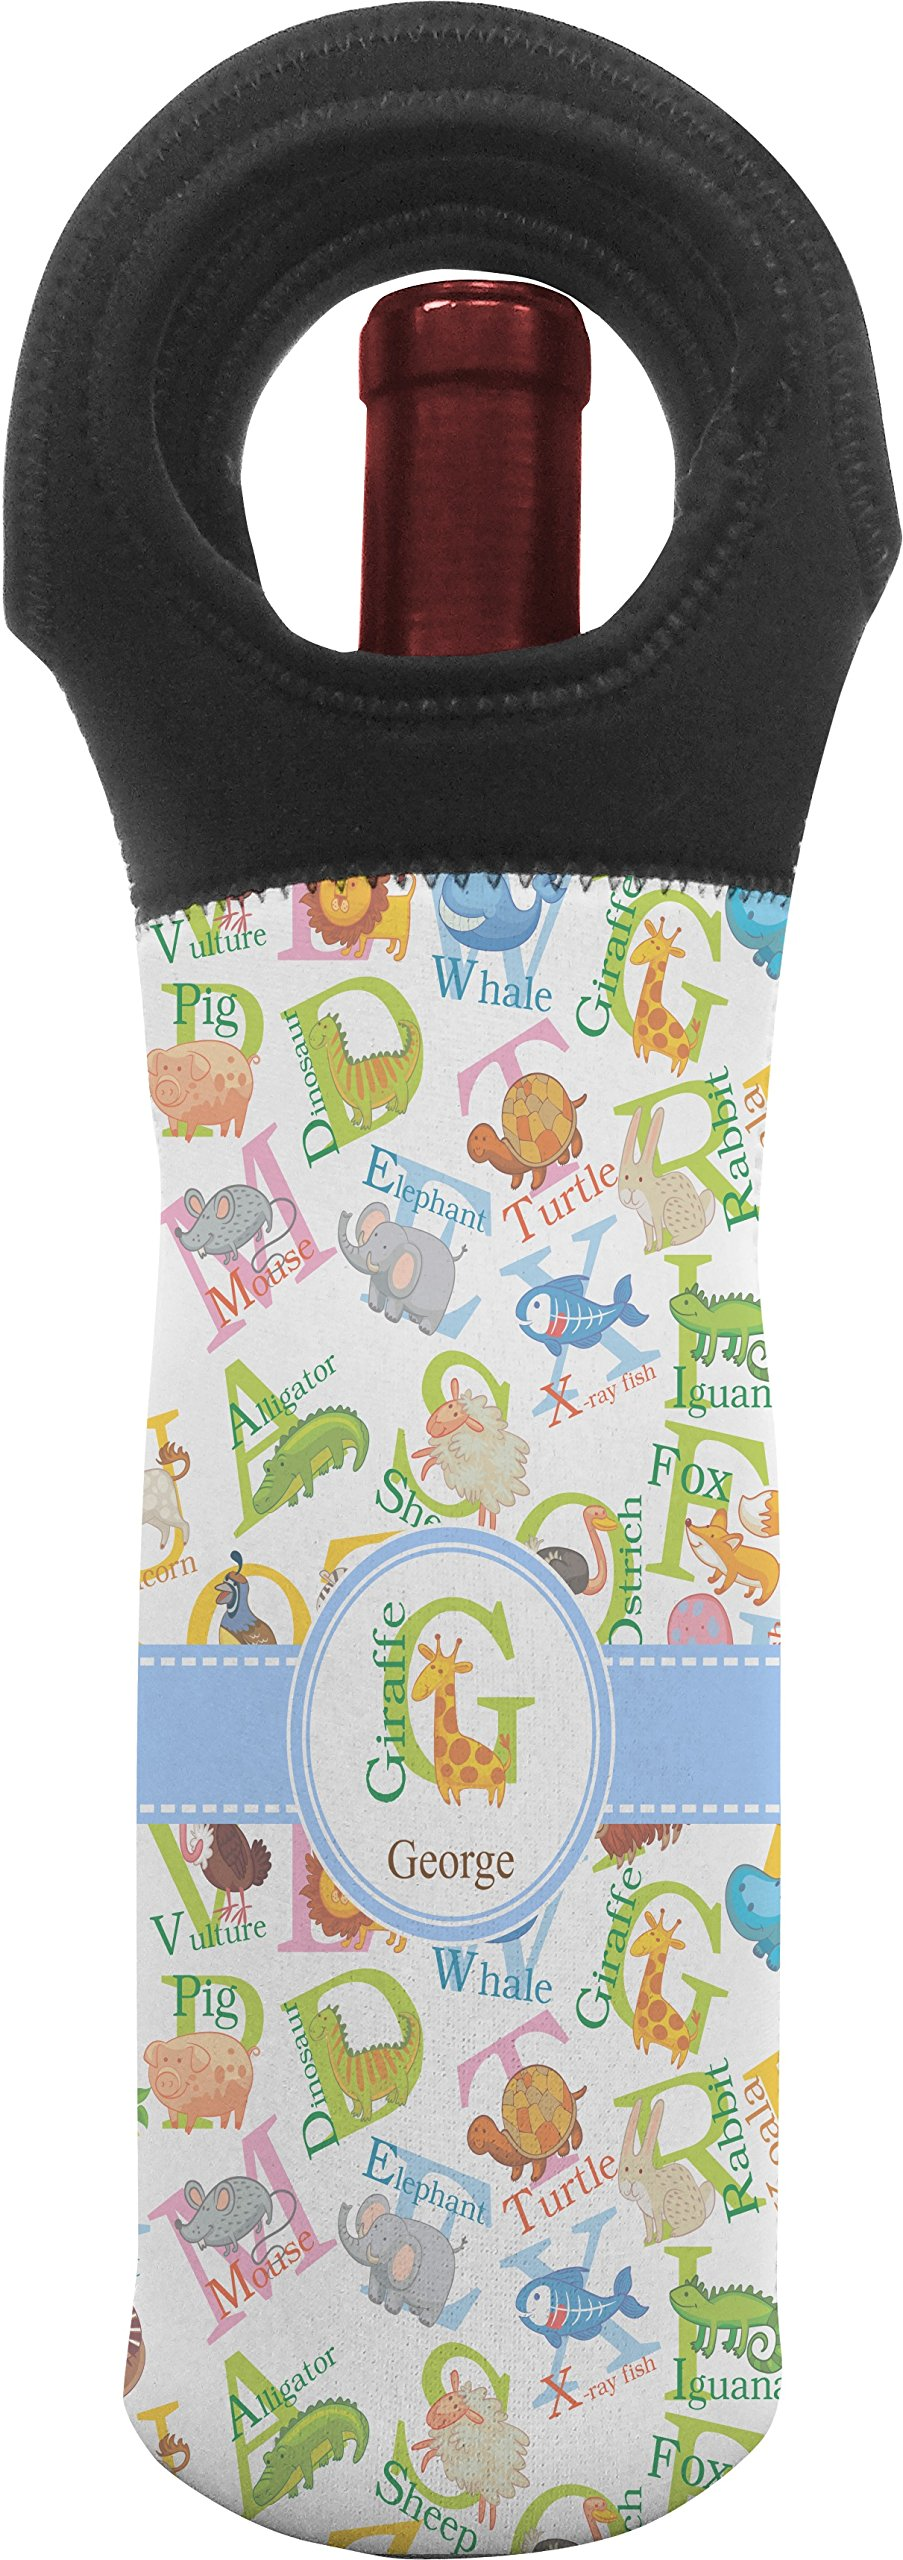 Animal Alphabet Wine Tote Bag (Personalized)